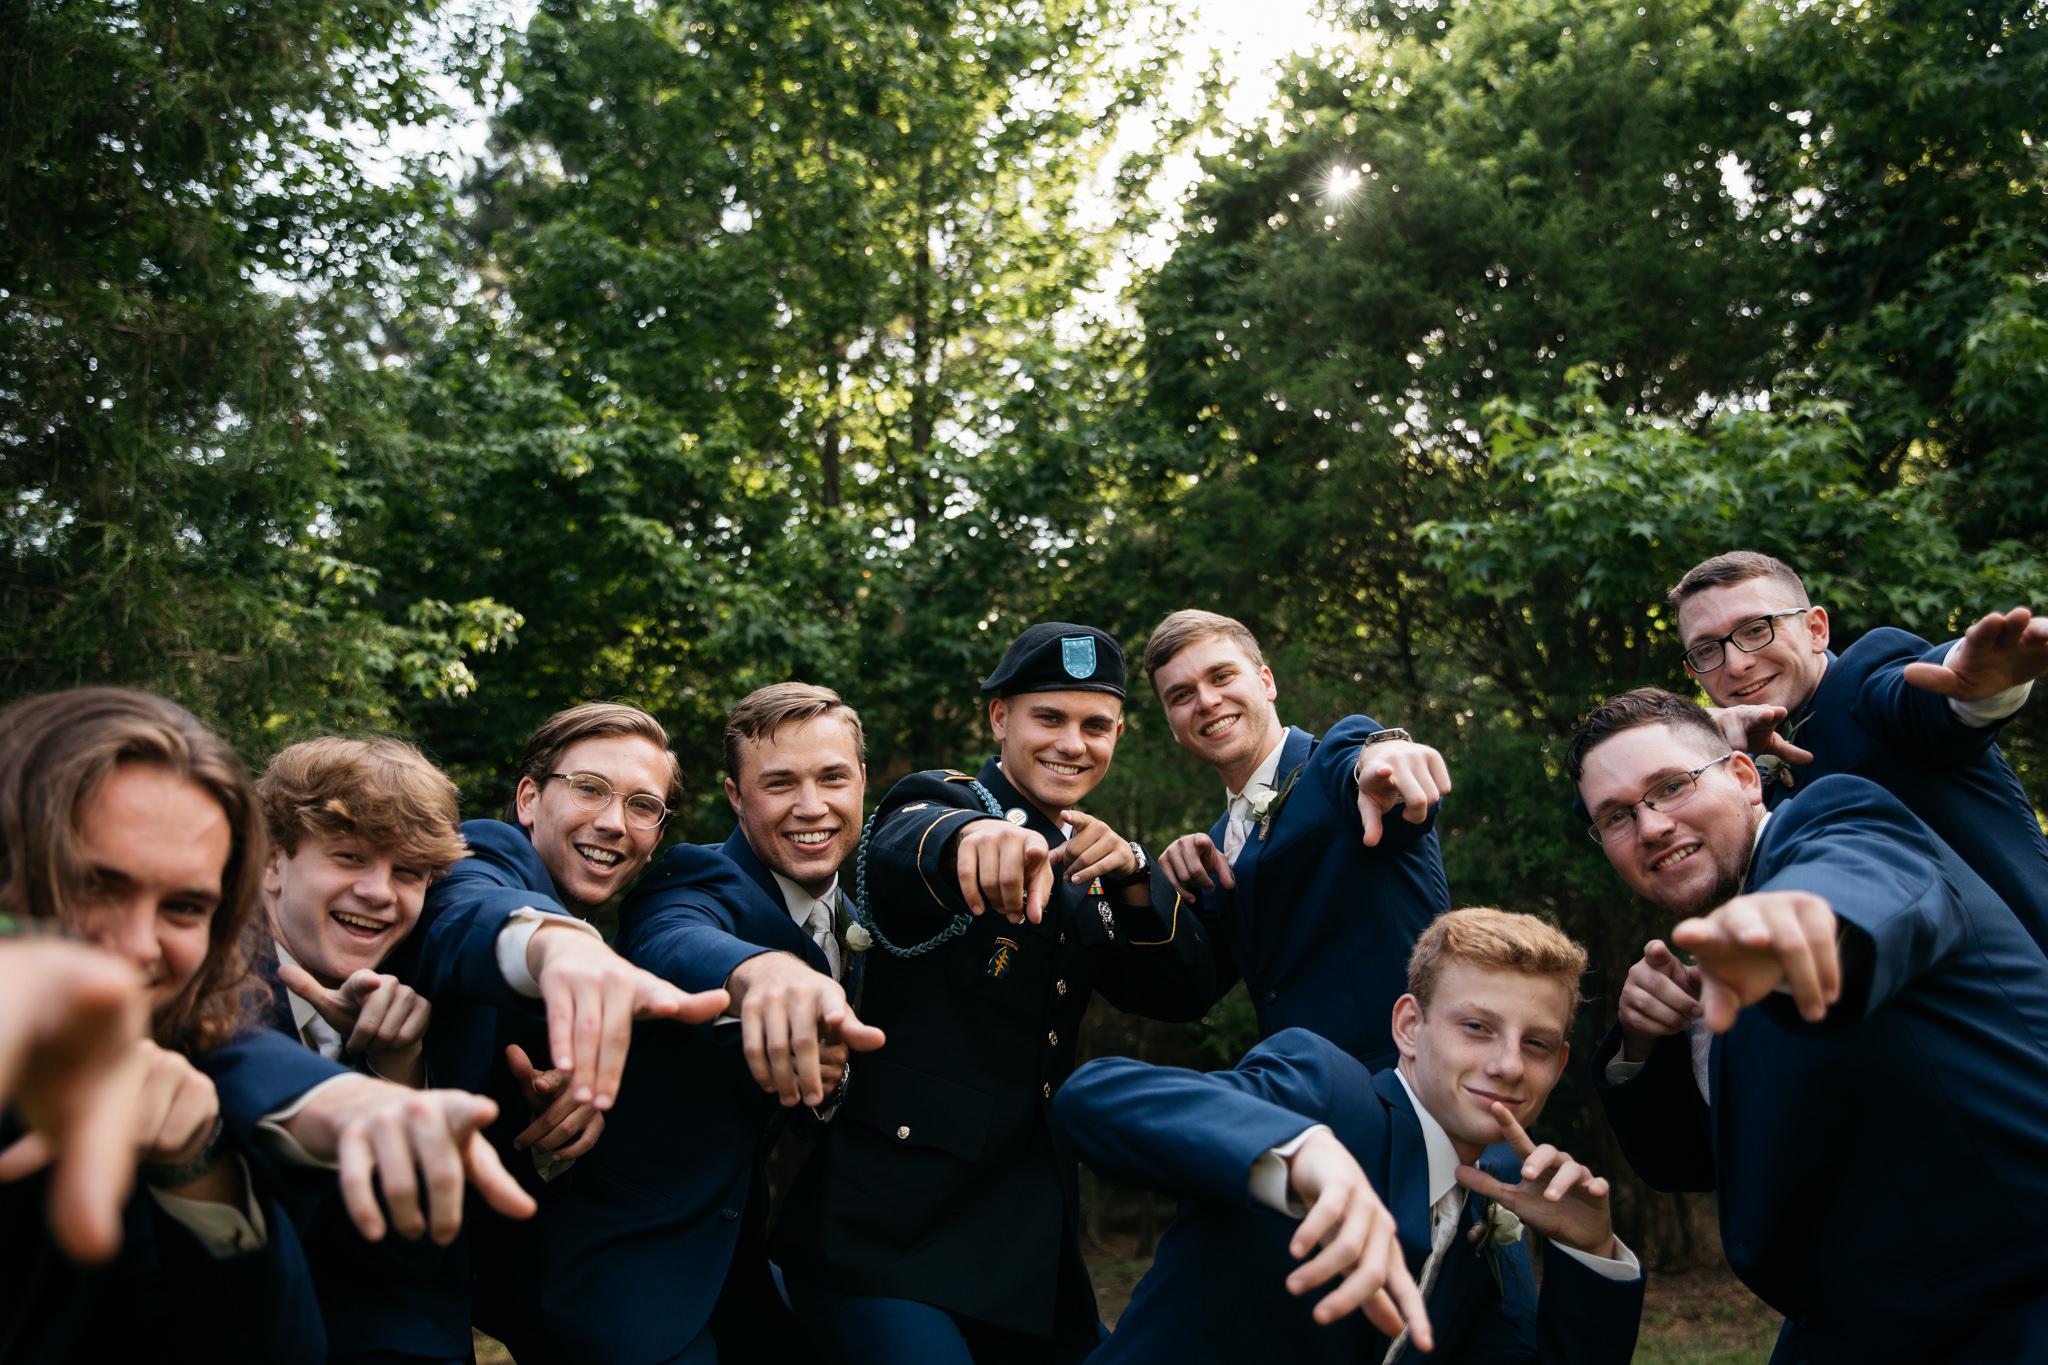 backyard-wedding-thewarmtharoundyou-lexy-branson-50.jpg